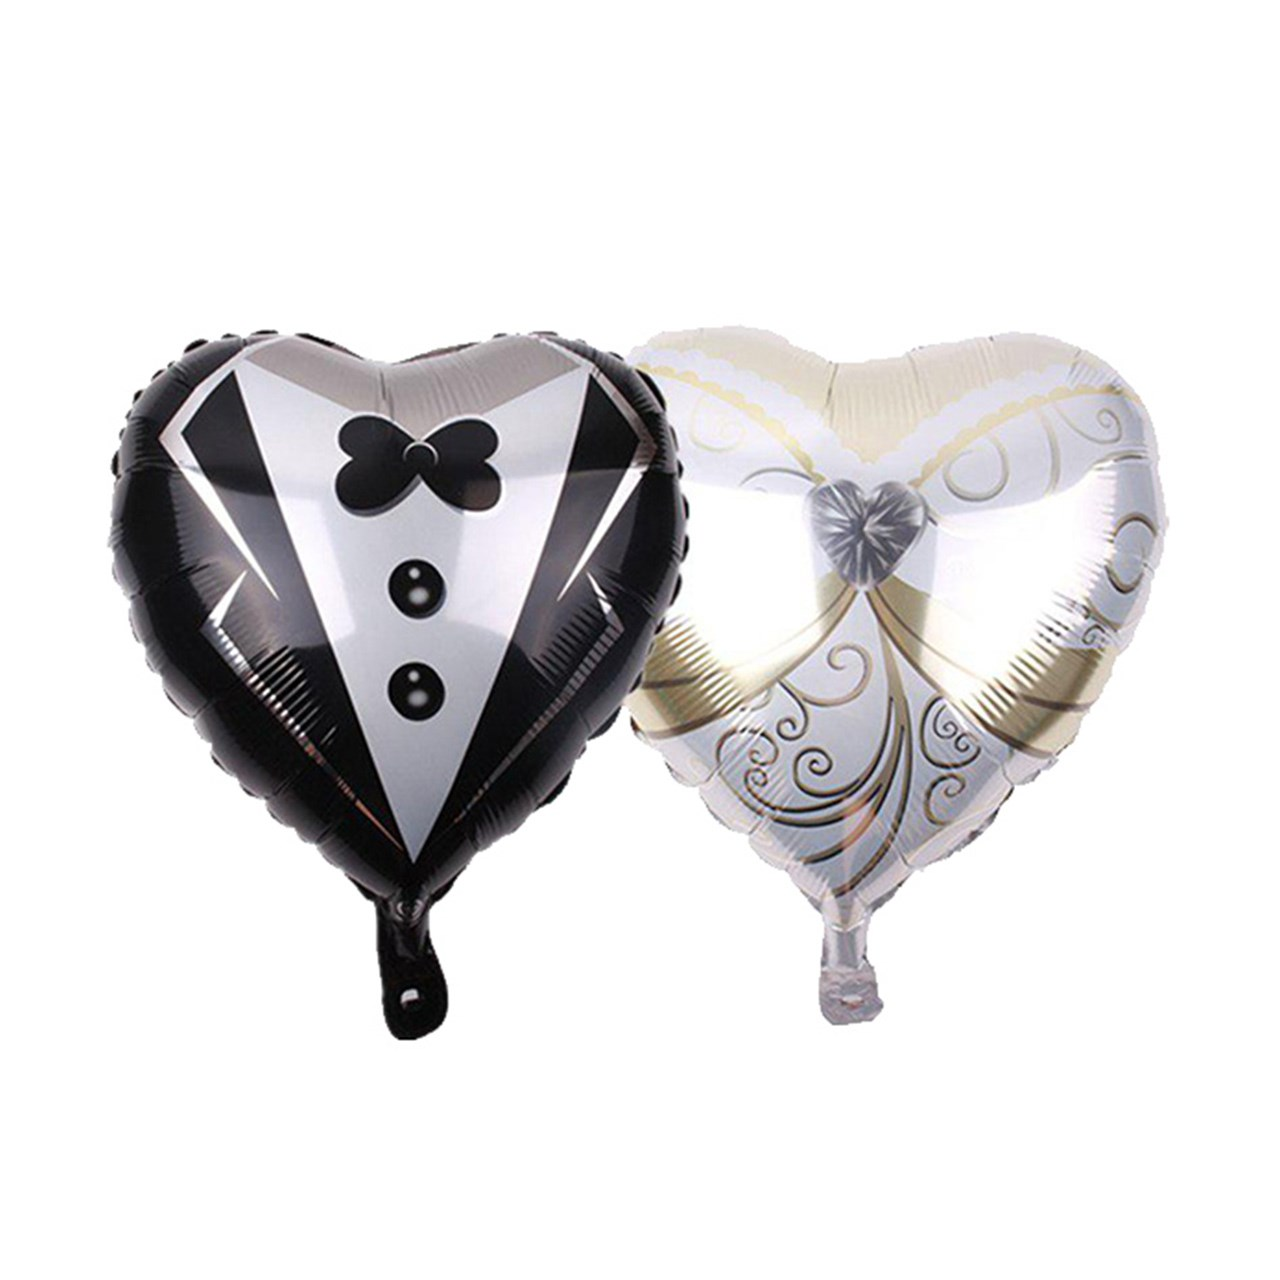 عکس بادکنک فویلی سورتک مدل قلب عروس و داماد بسته 2 عددی